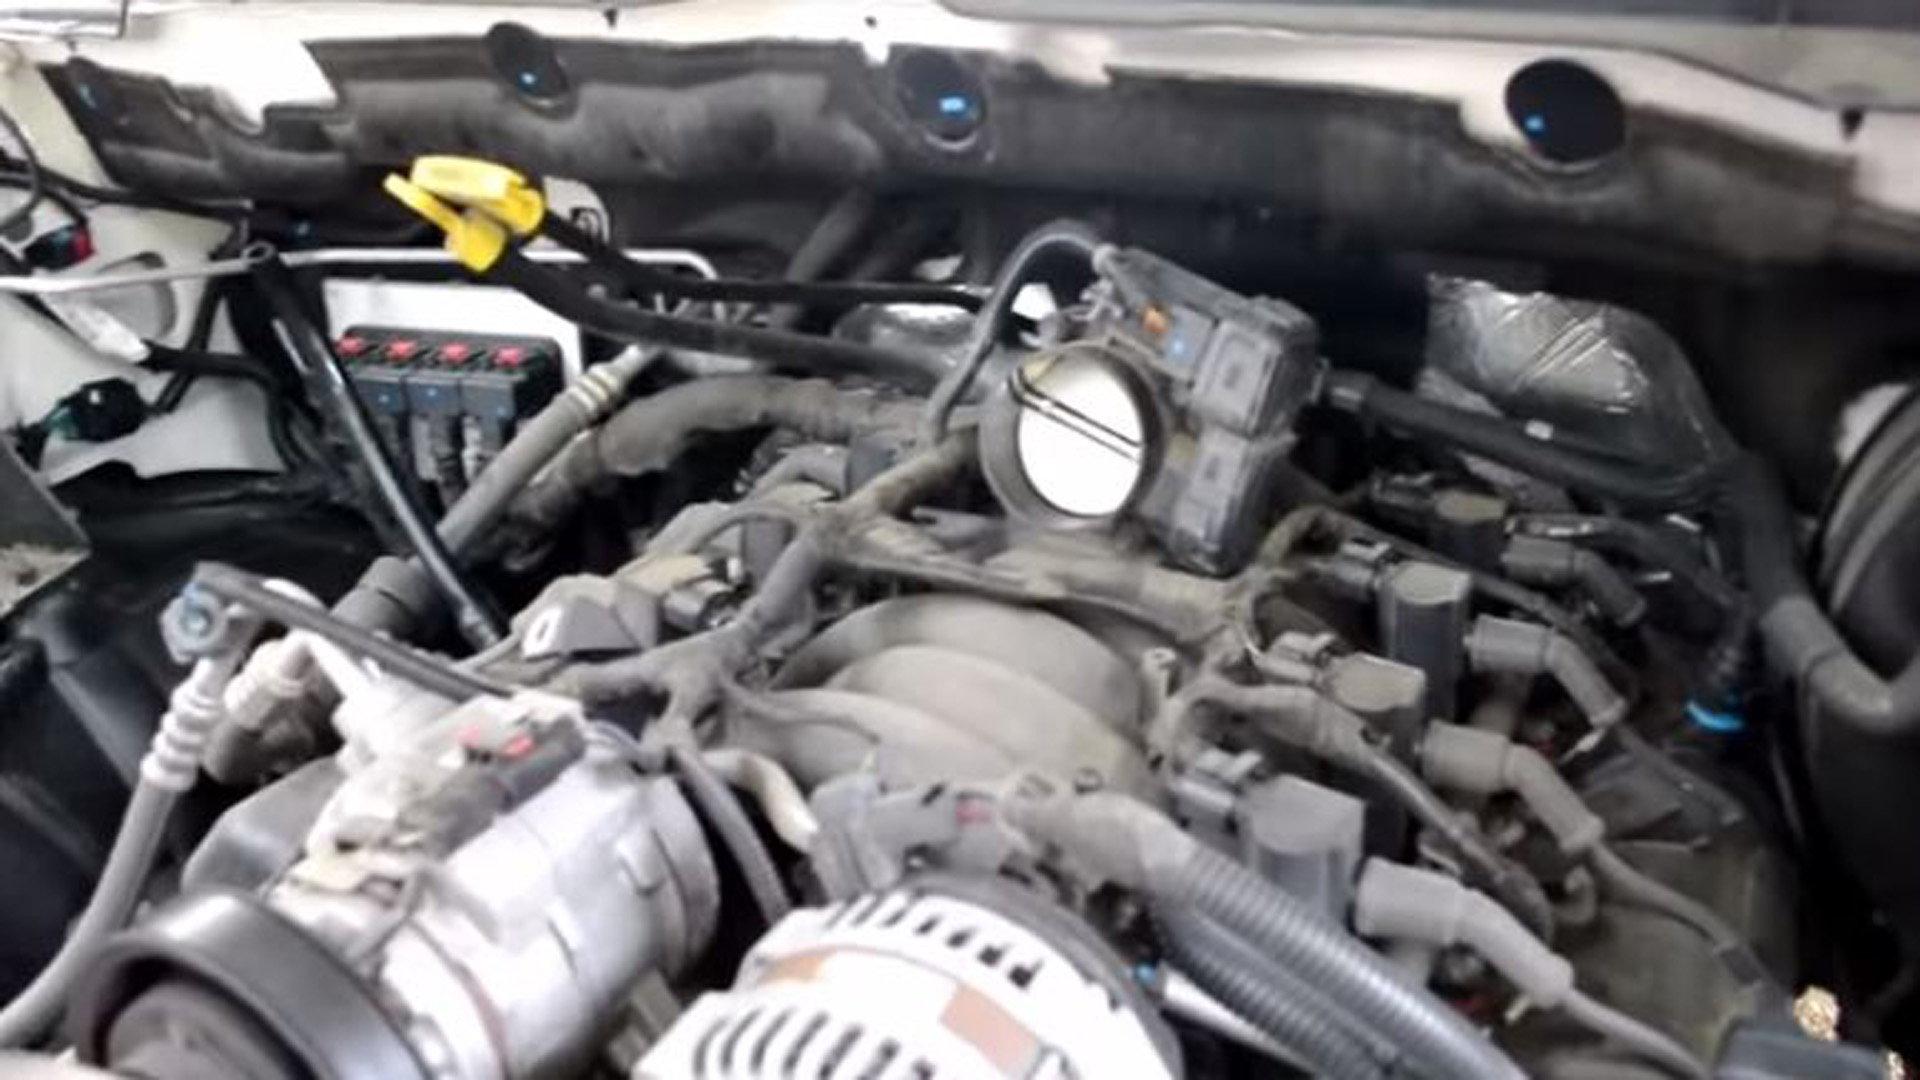 04 2004 Dodge Durango 3.7L 3.7 V6 Magnum Throttle Body Unit Assembly Fuel Gas